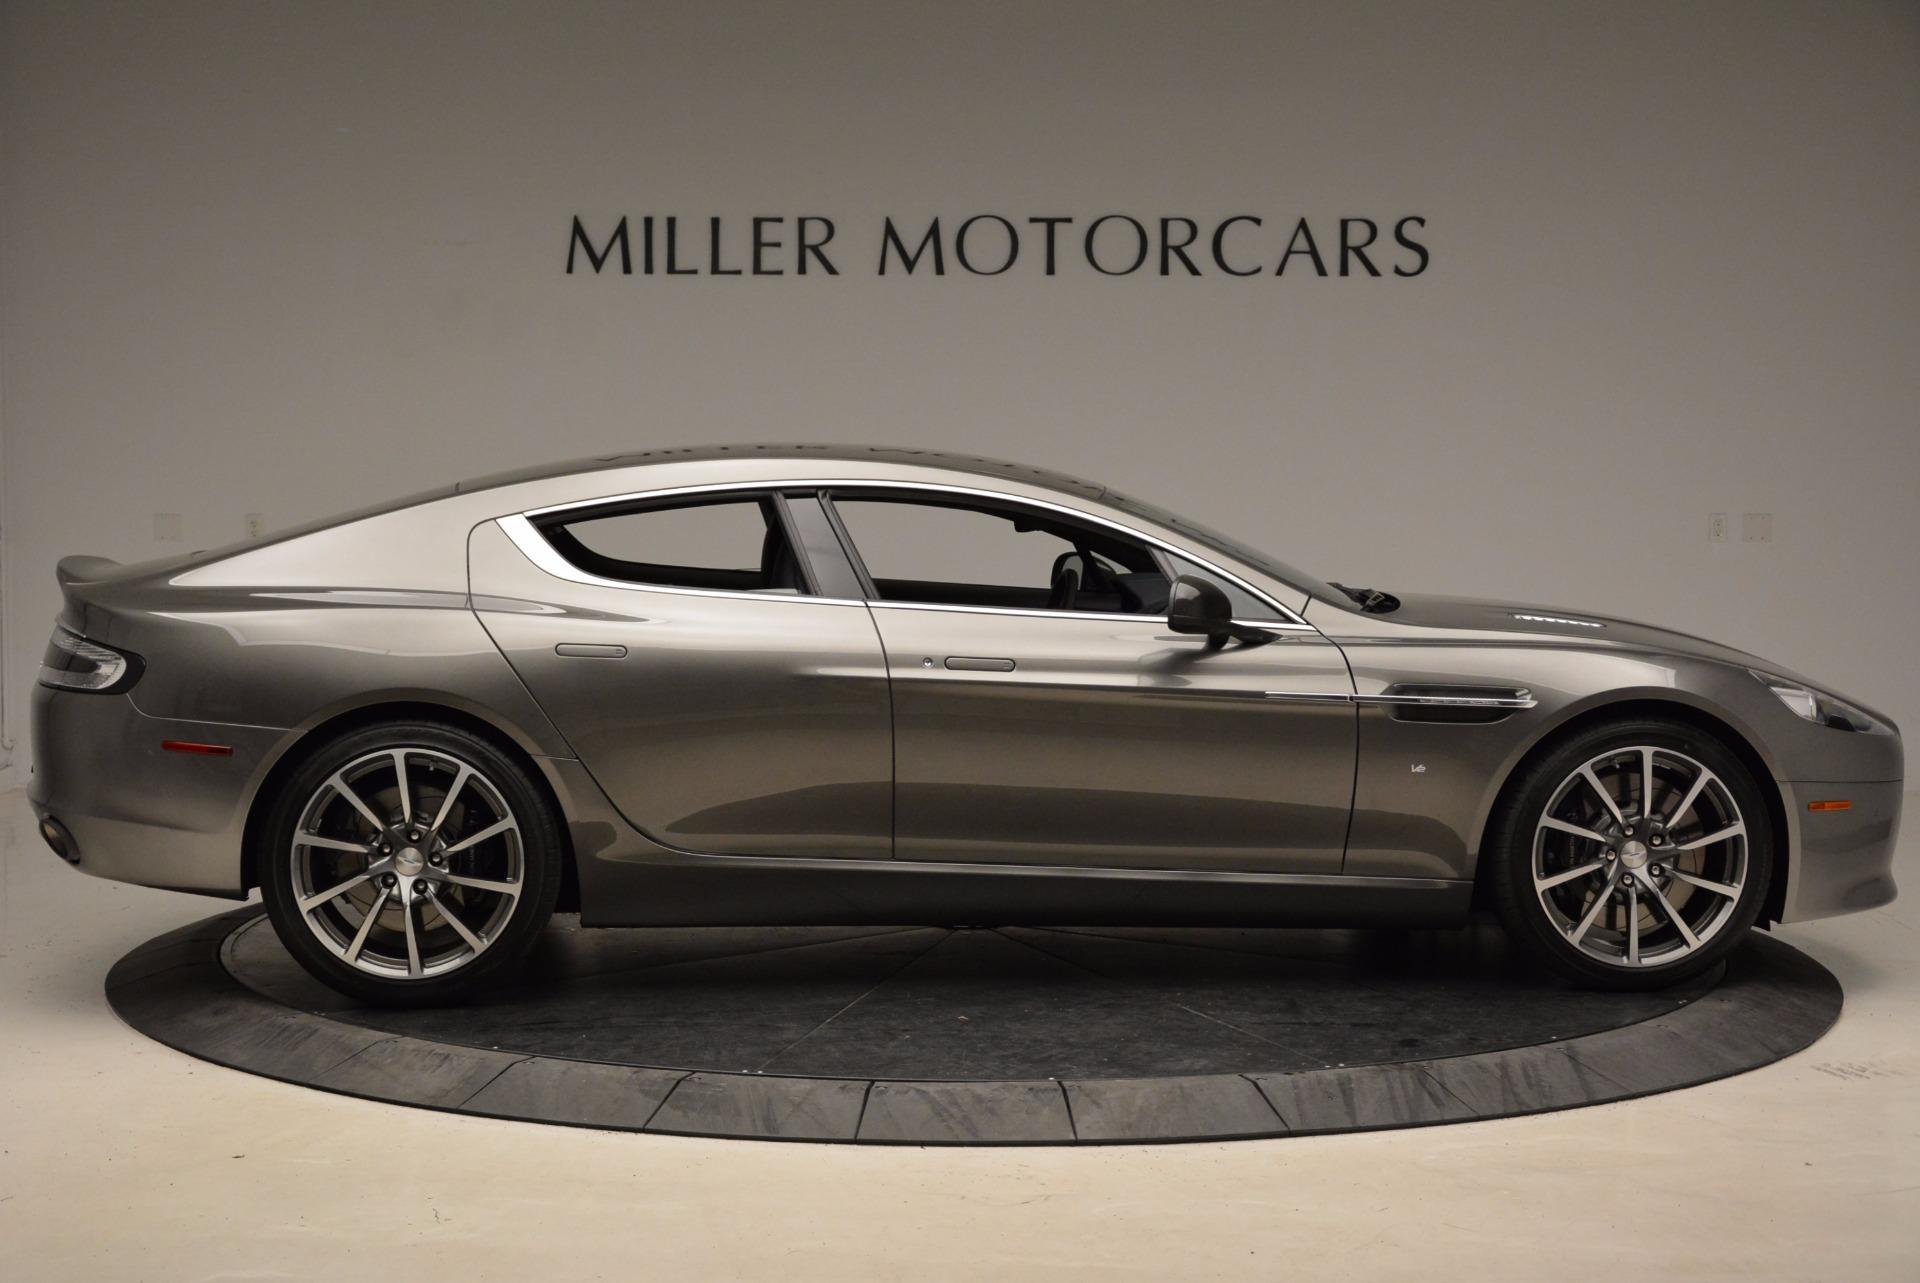 Used 2017 Aston Martin Rapide S Sedan For Sale In Greenwich, CT 1843_p9